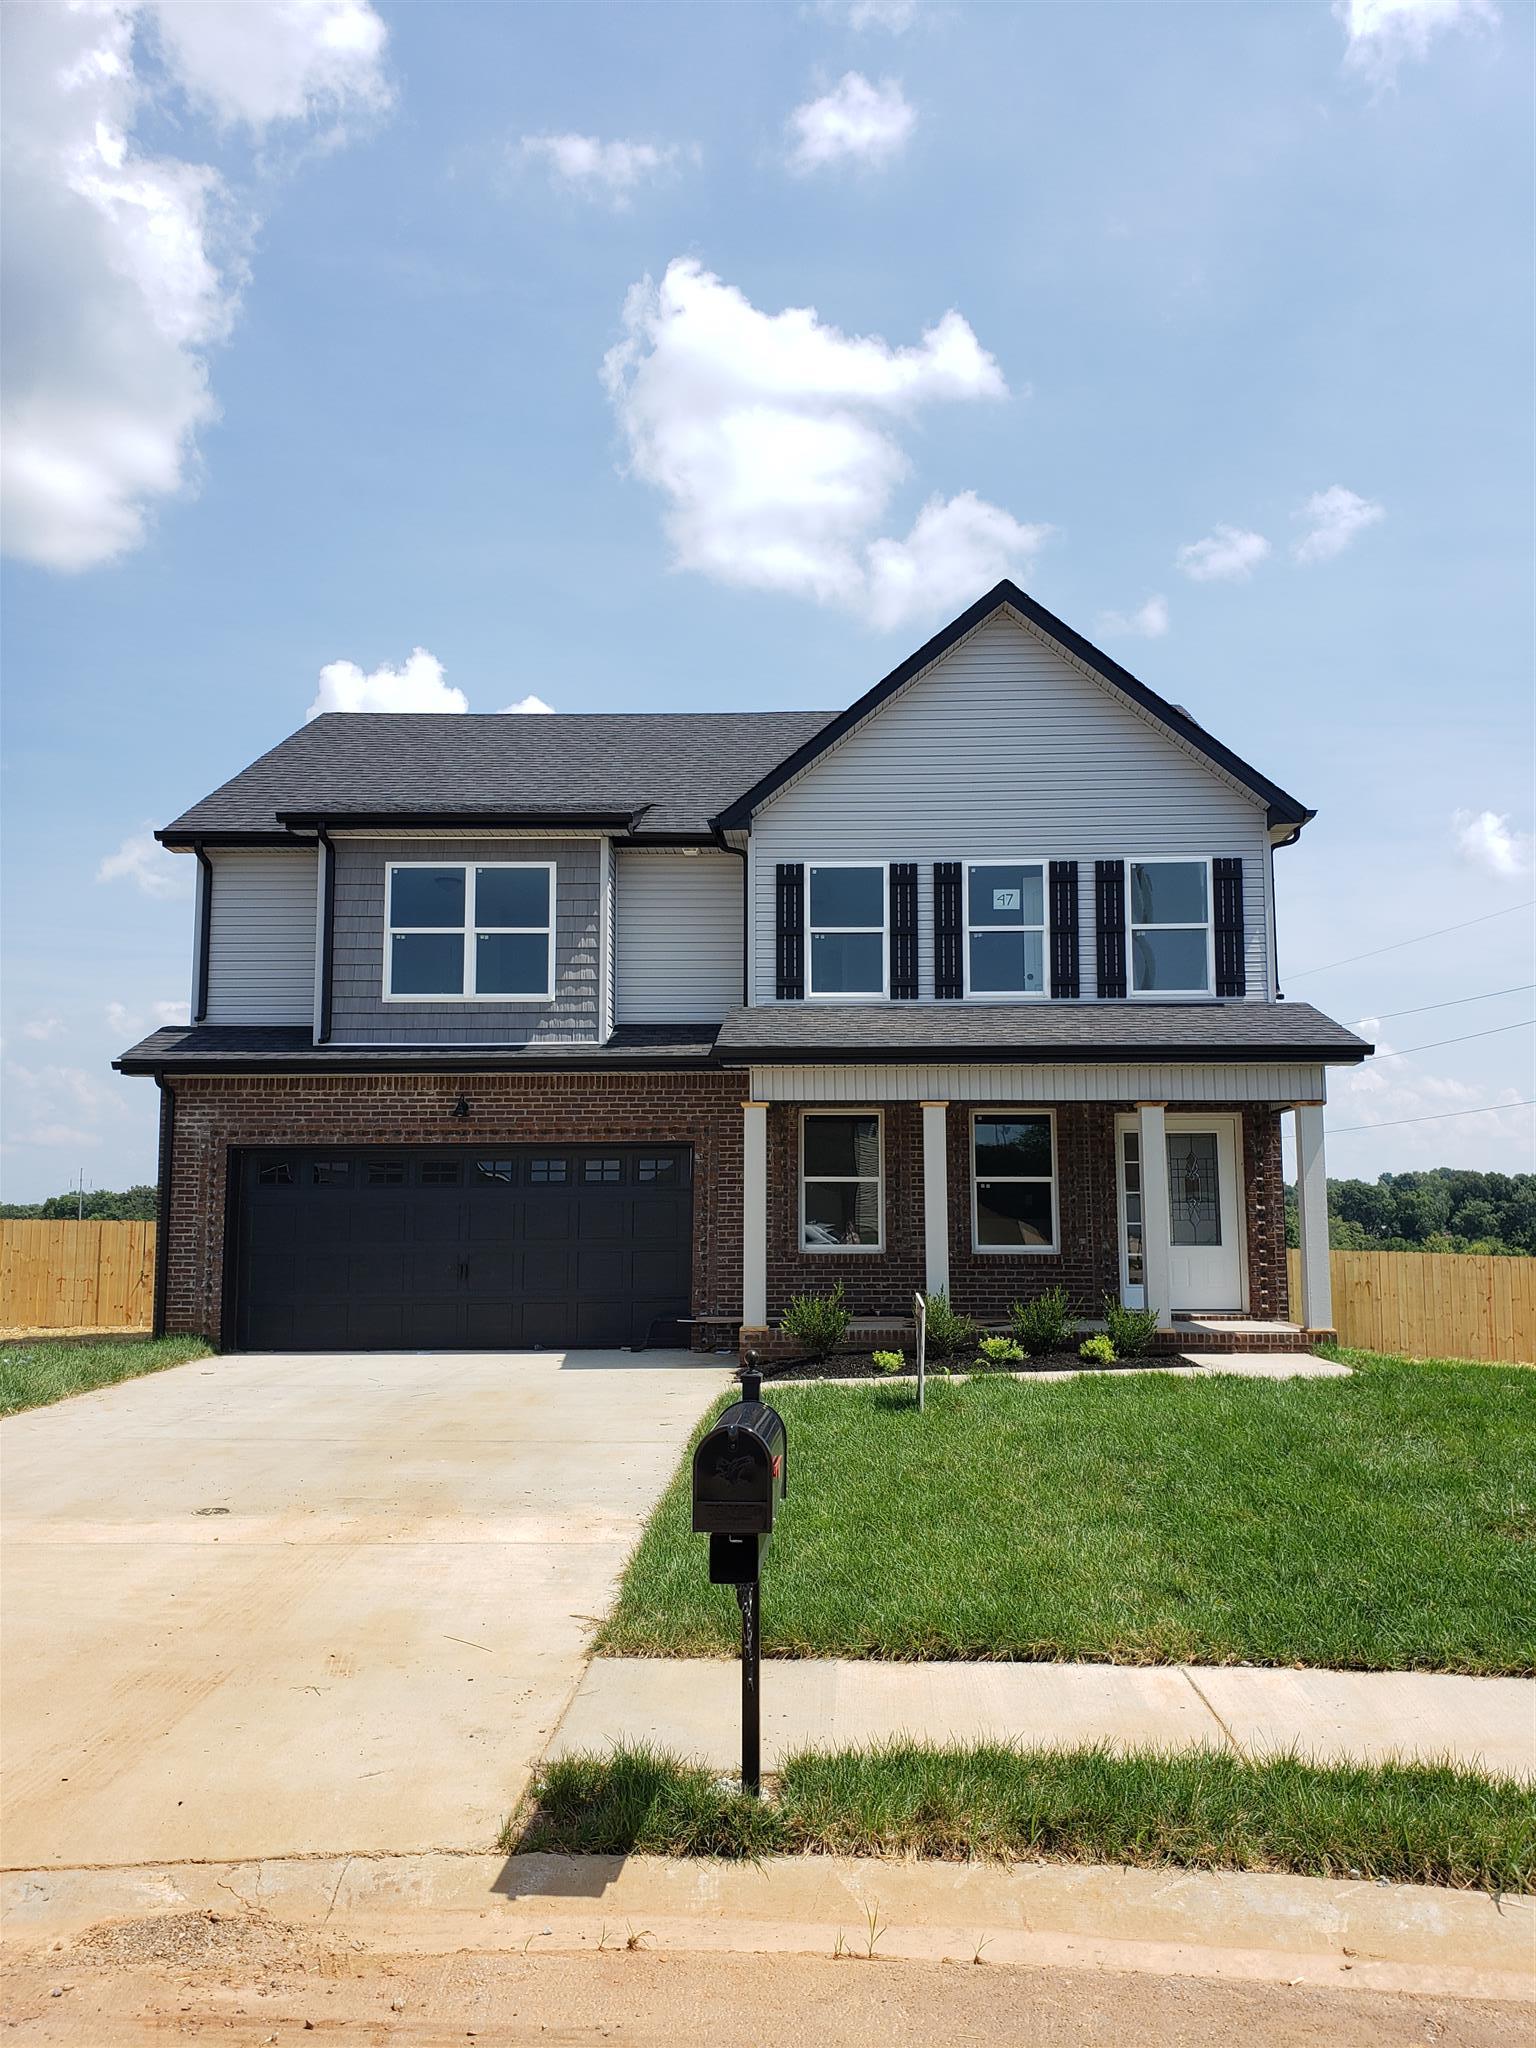 591 Silver Oak Court, Lot 47, Clarksville, TN 37042 - Clarksville, TN real estate listing